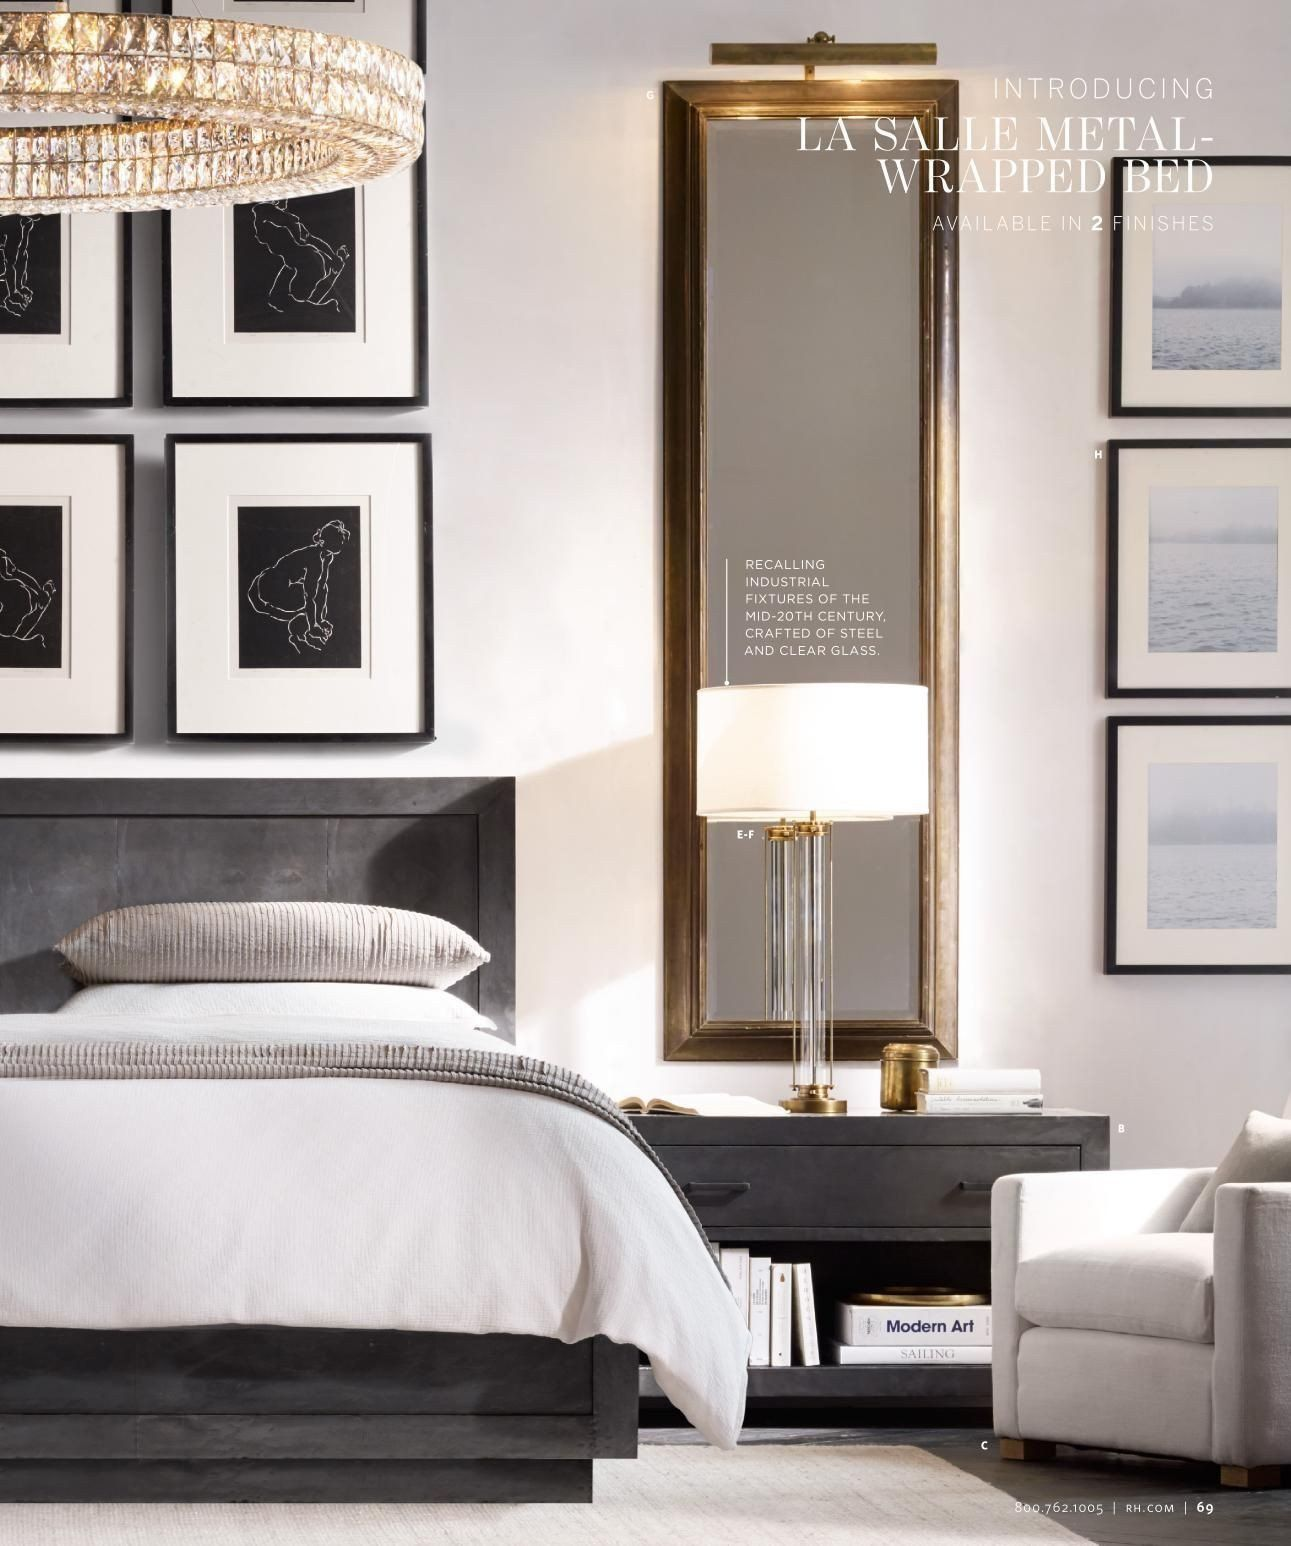 30 restoration hardware bedroom ideas restoration on unique contemporary bedroom design ideas for more inspiration id=52067